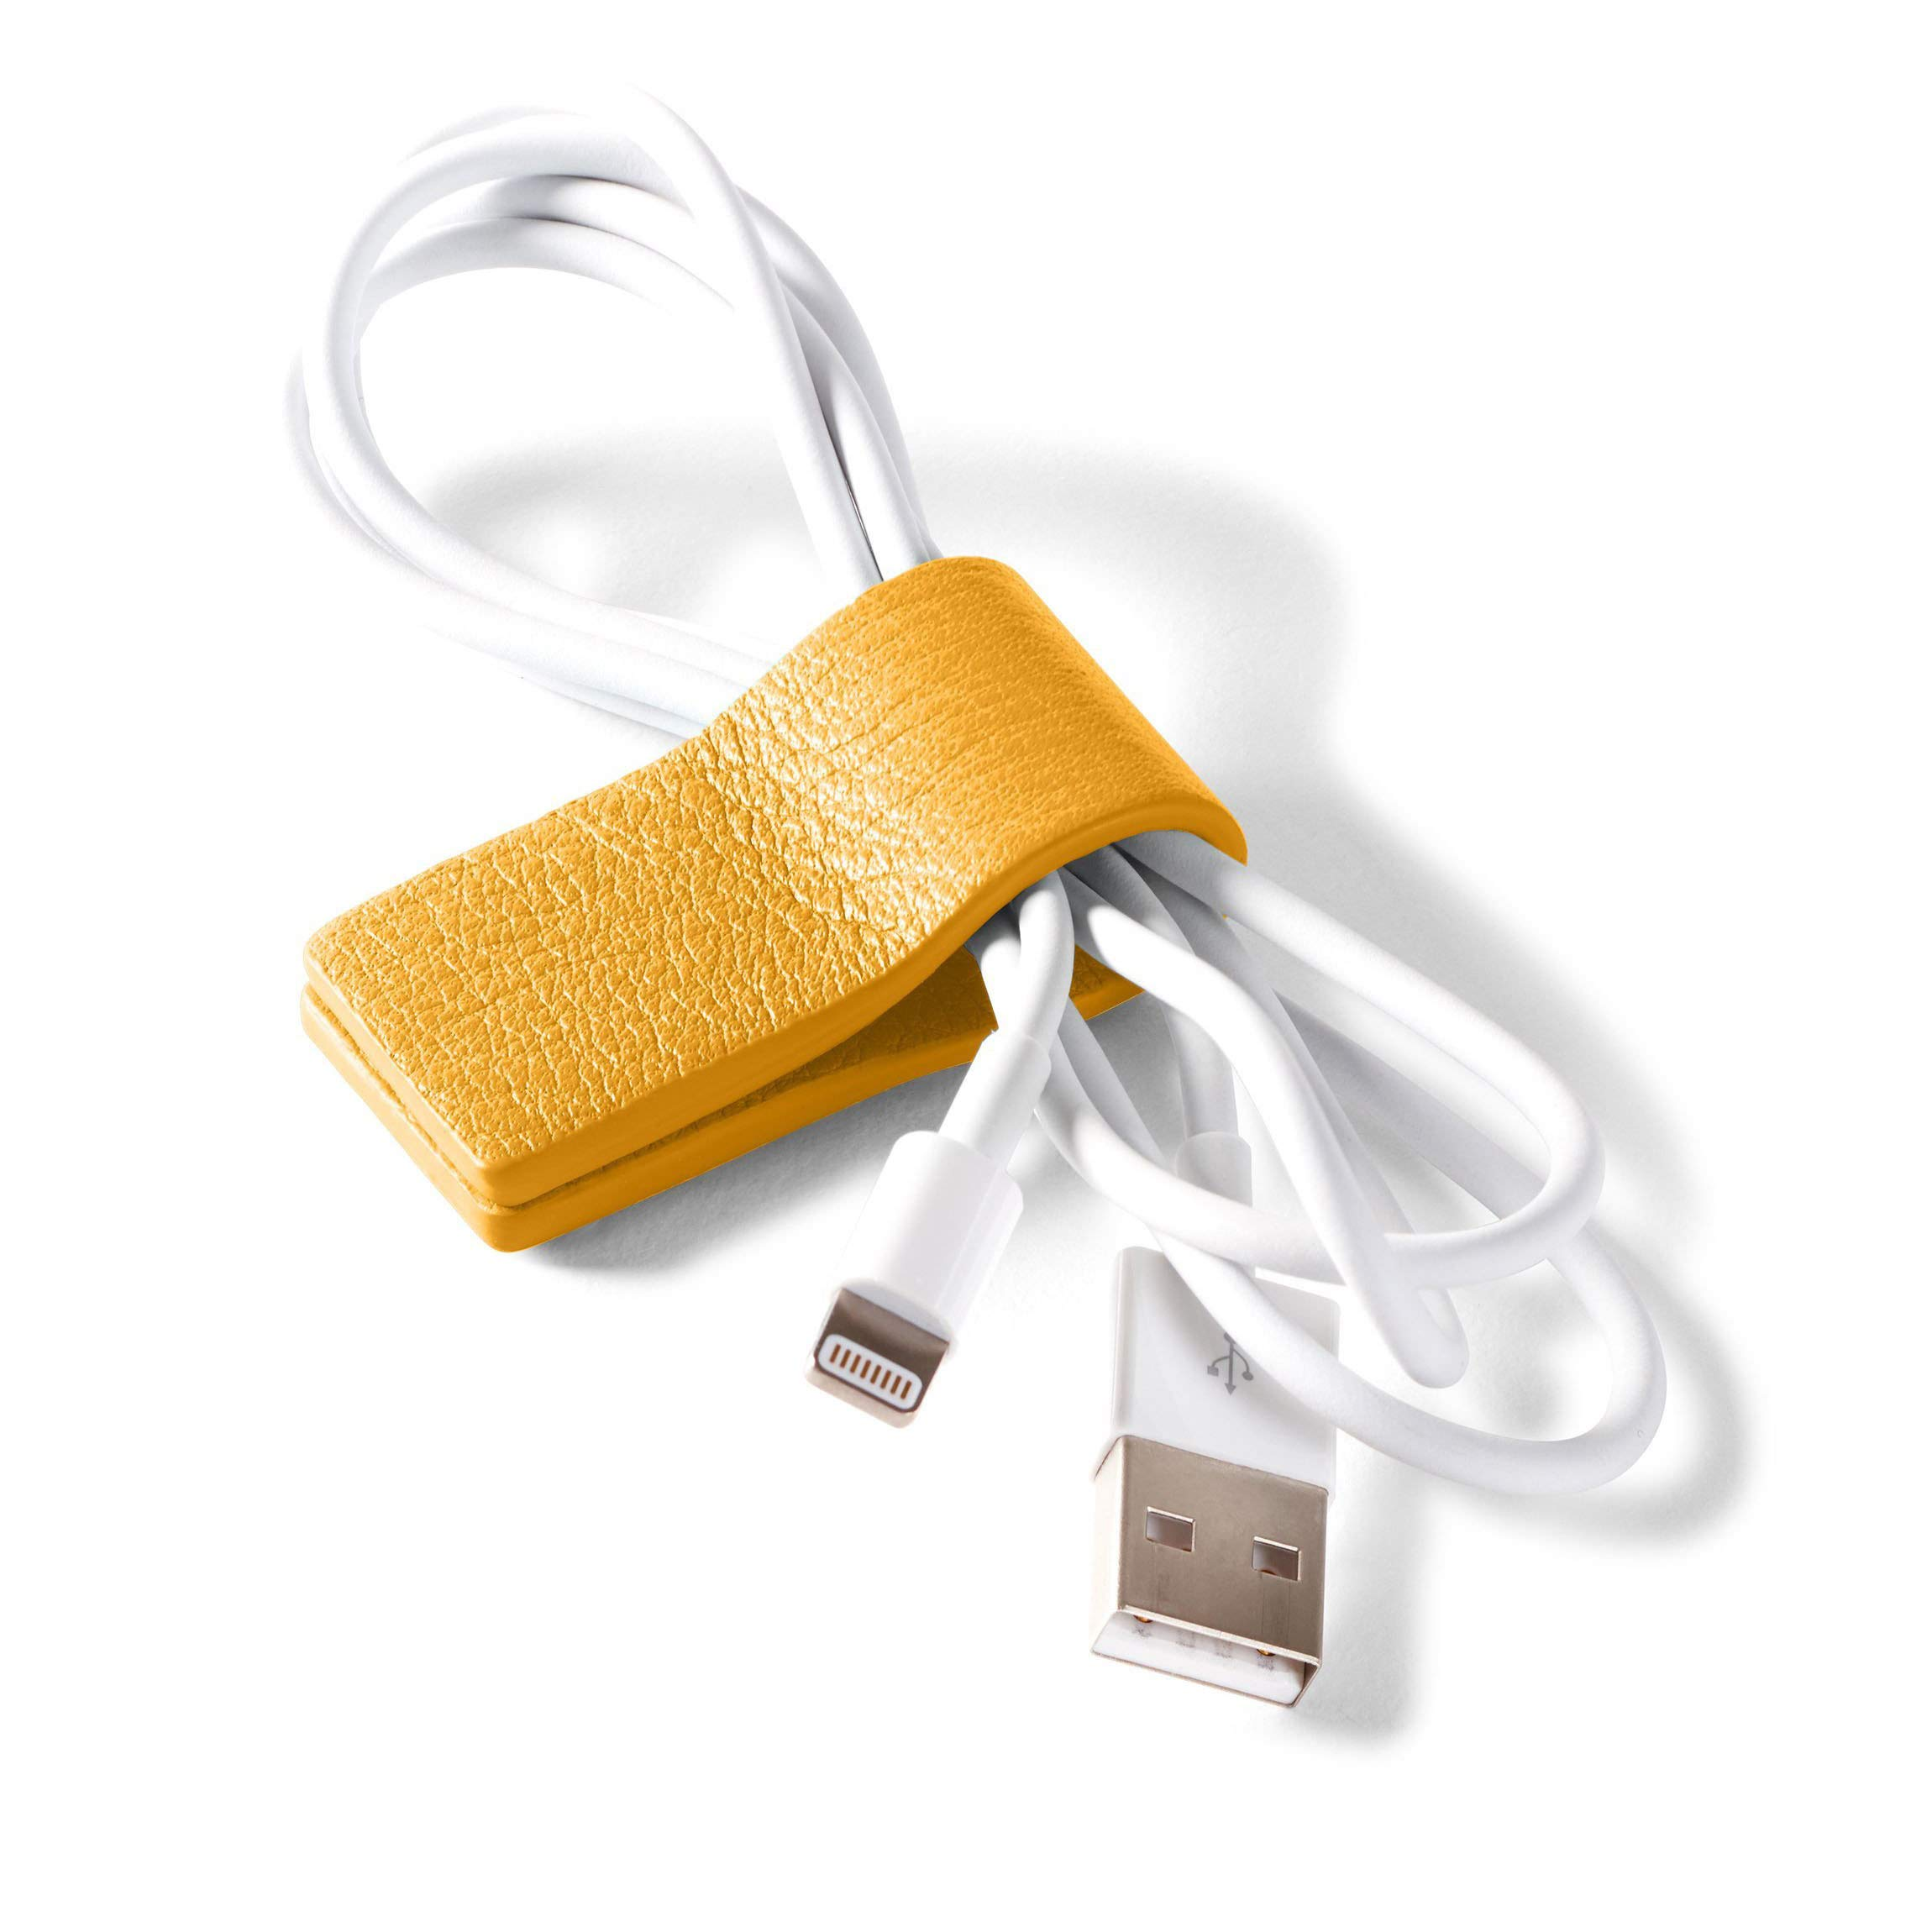 Cord Wrap - Full Grain Leather Leather - Turmeric (Yellow)